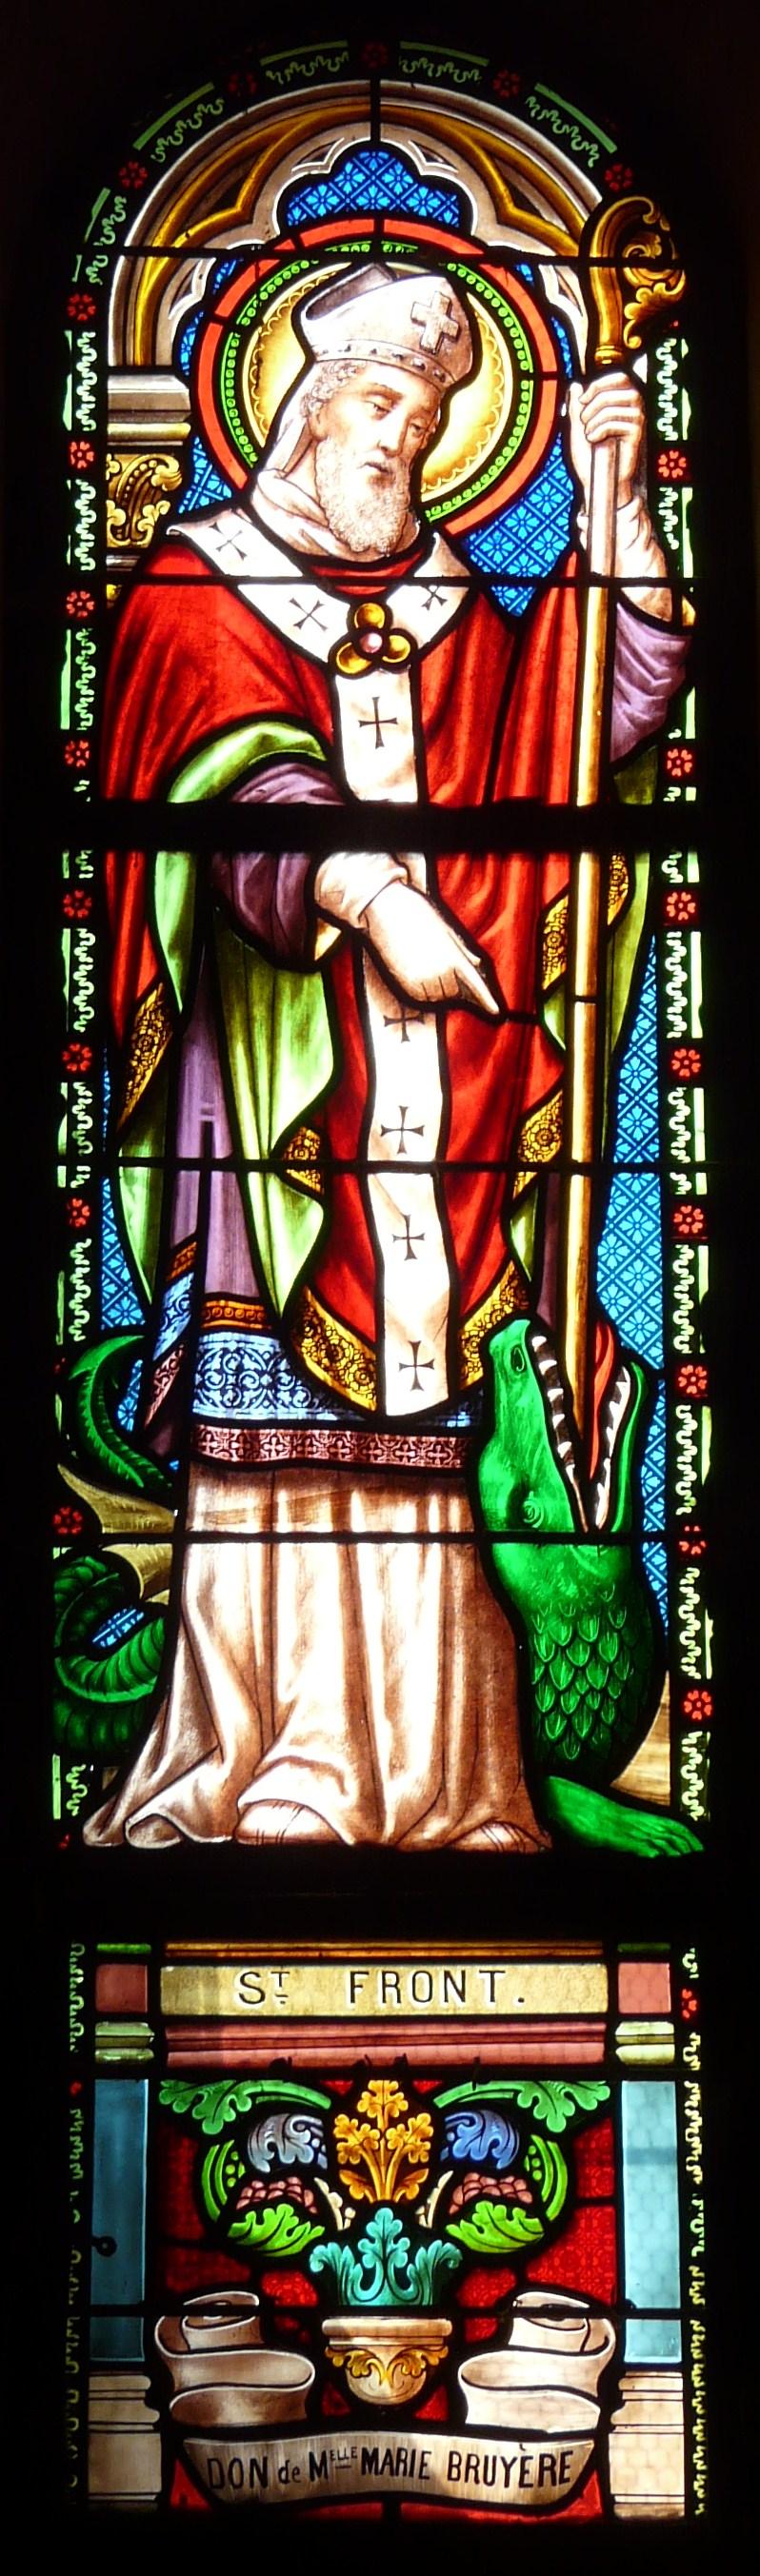 sveti Fronton - škof